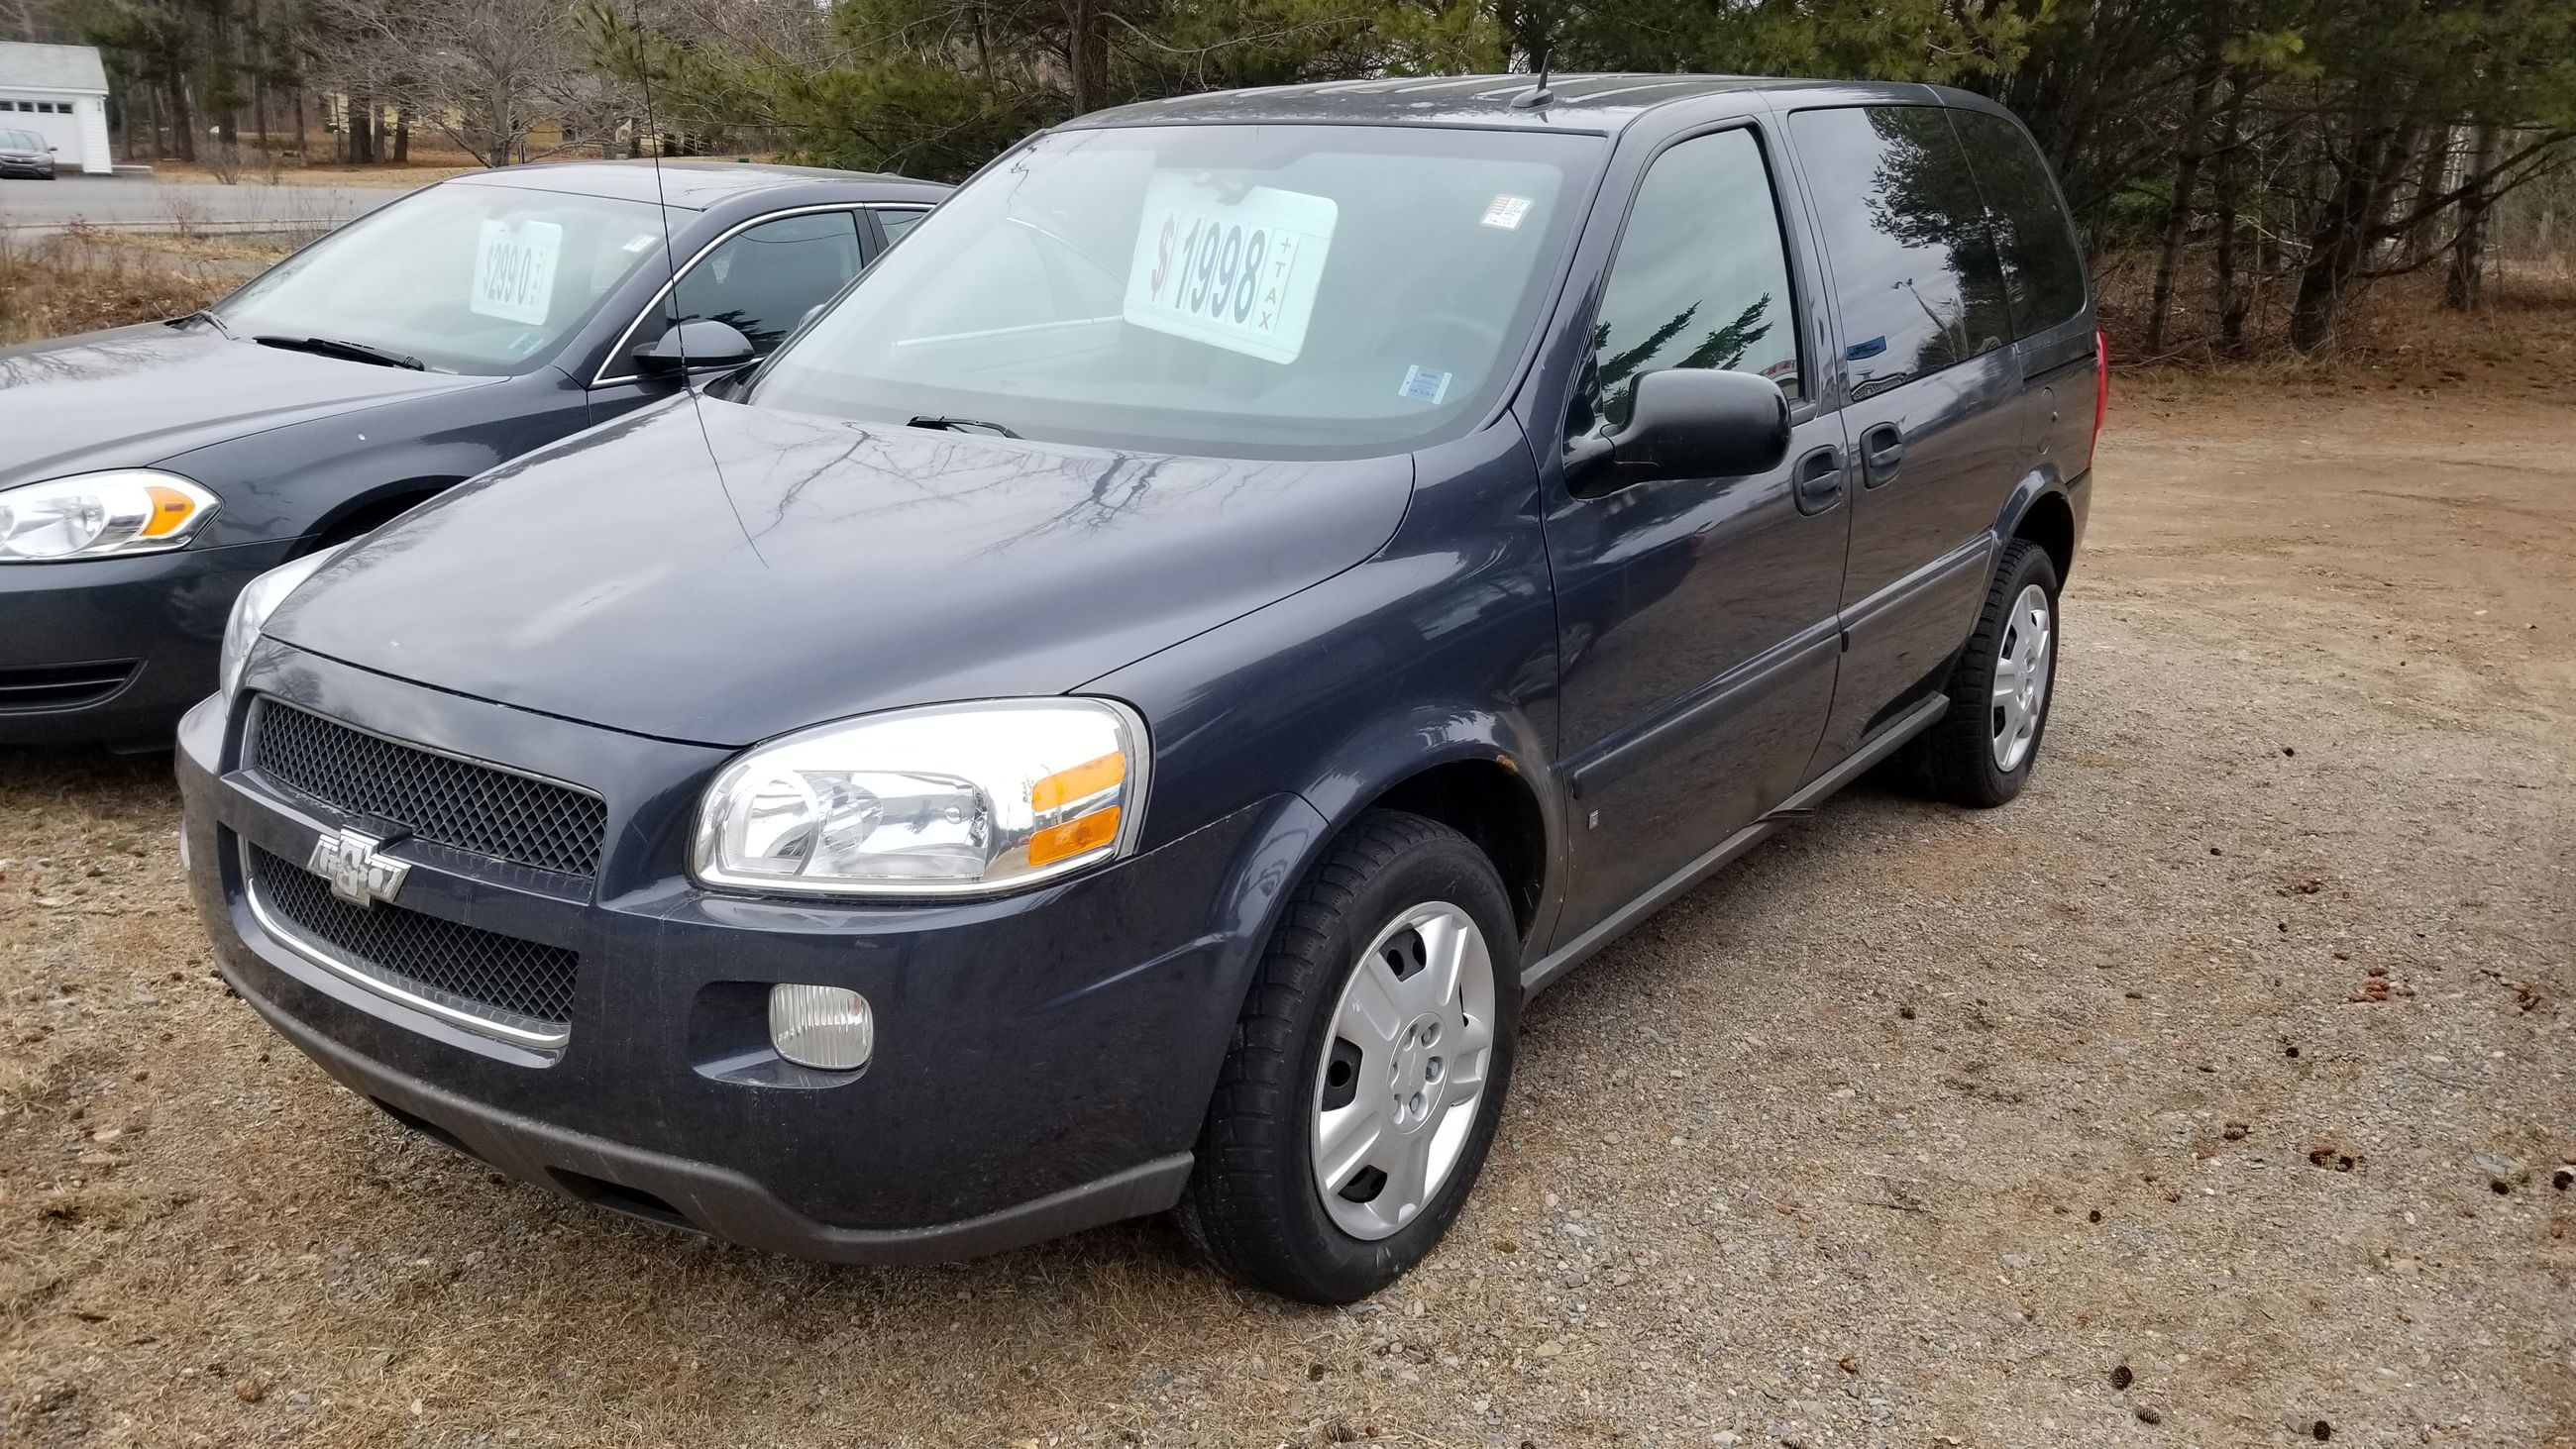 Used 2008 Chevrolet Uplander Ls In Kentville Used Inventory Kings County Honda In Kentville Nova Scotia